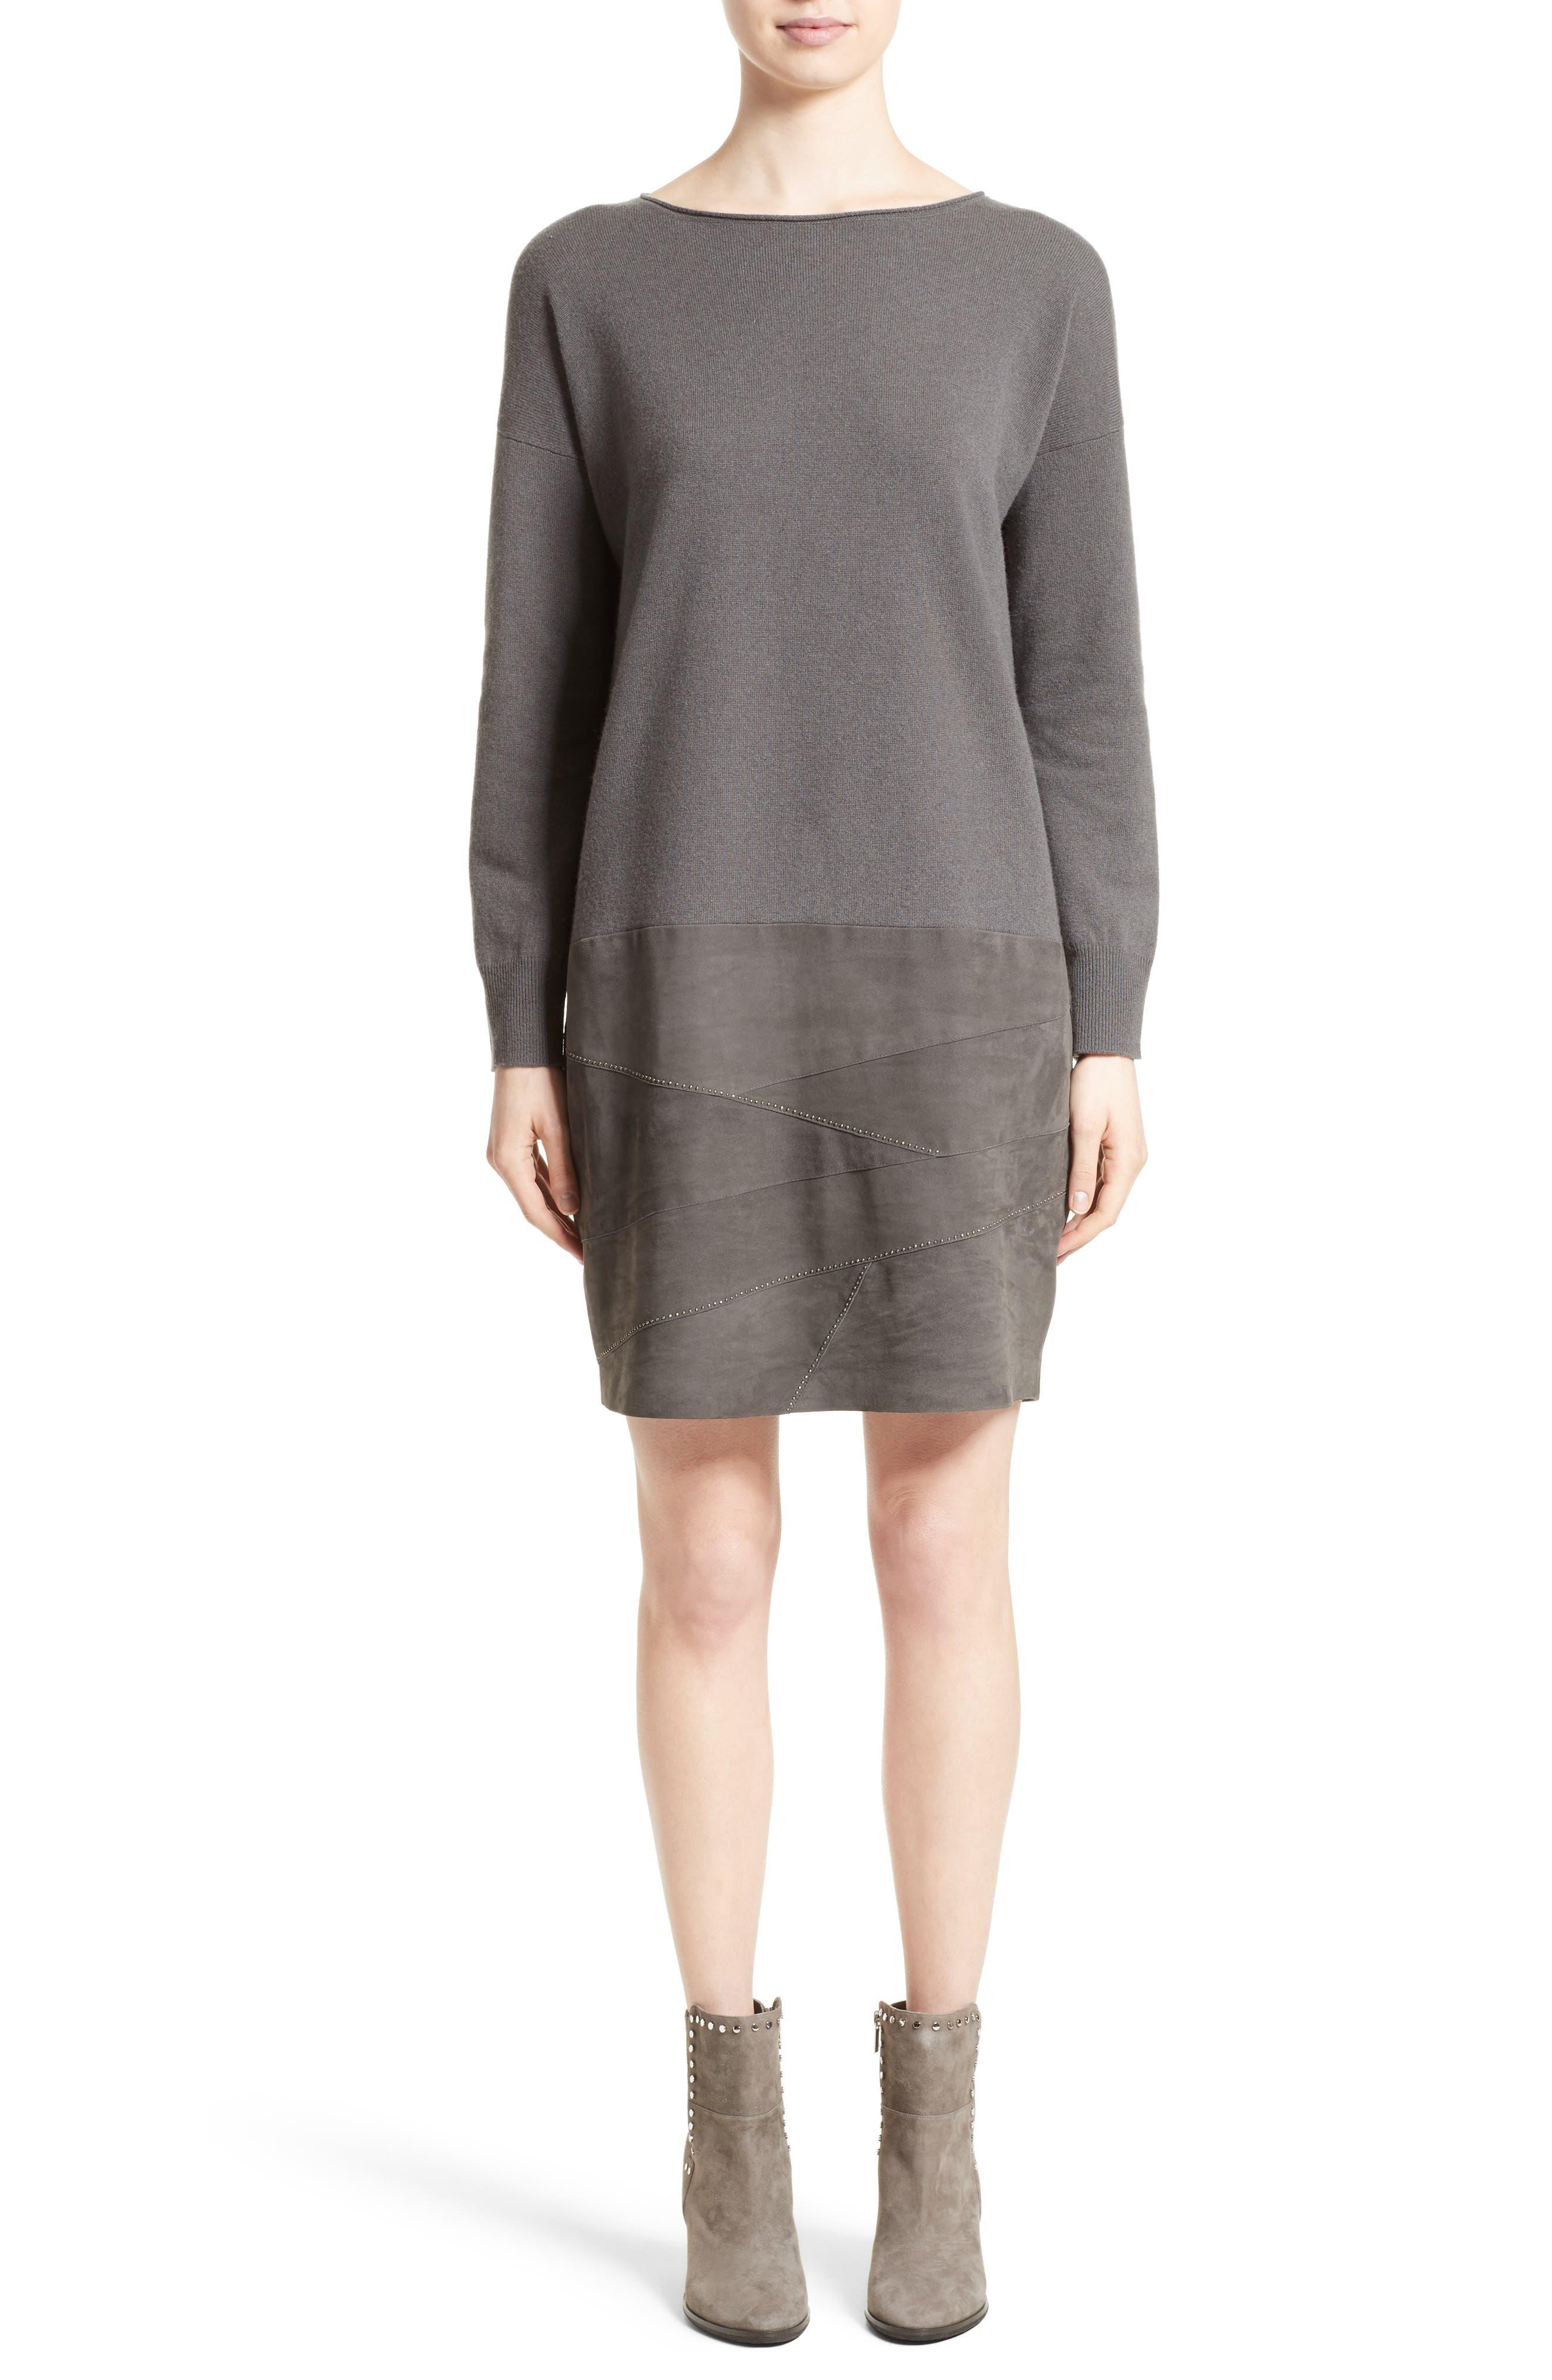 Fabiana Filippi Suede Panel Wool Blend Knit Dress